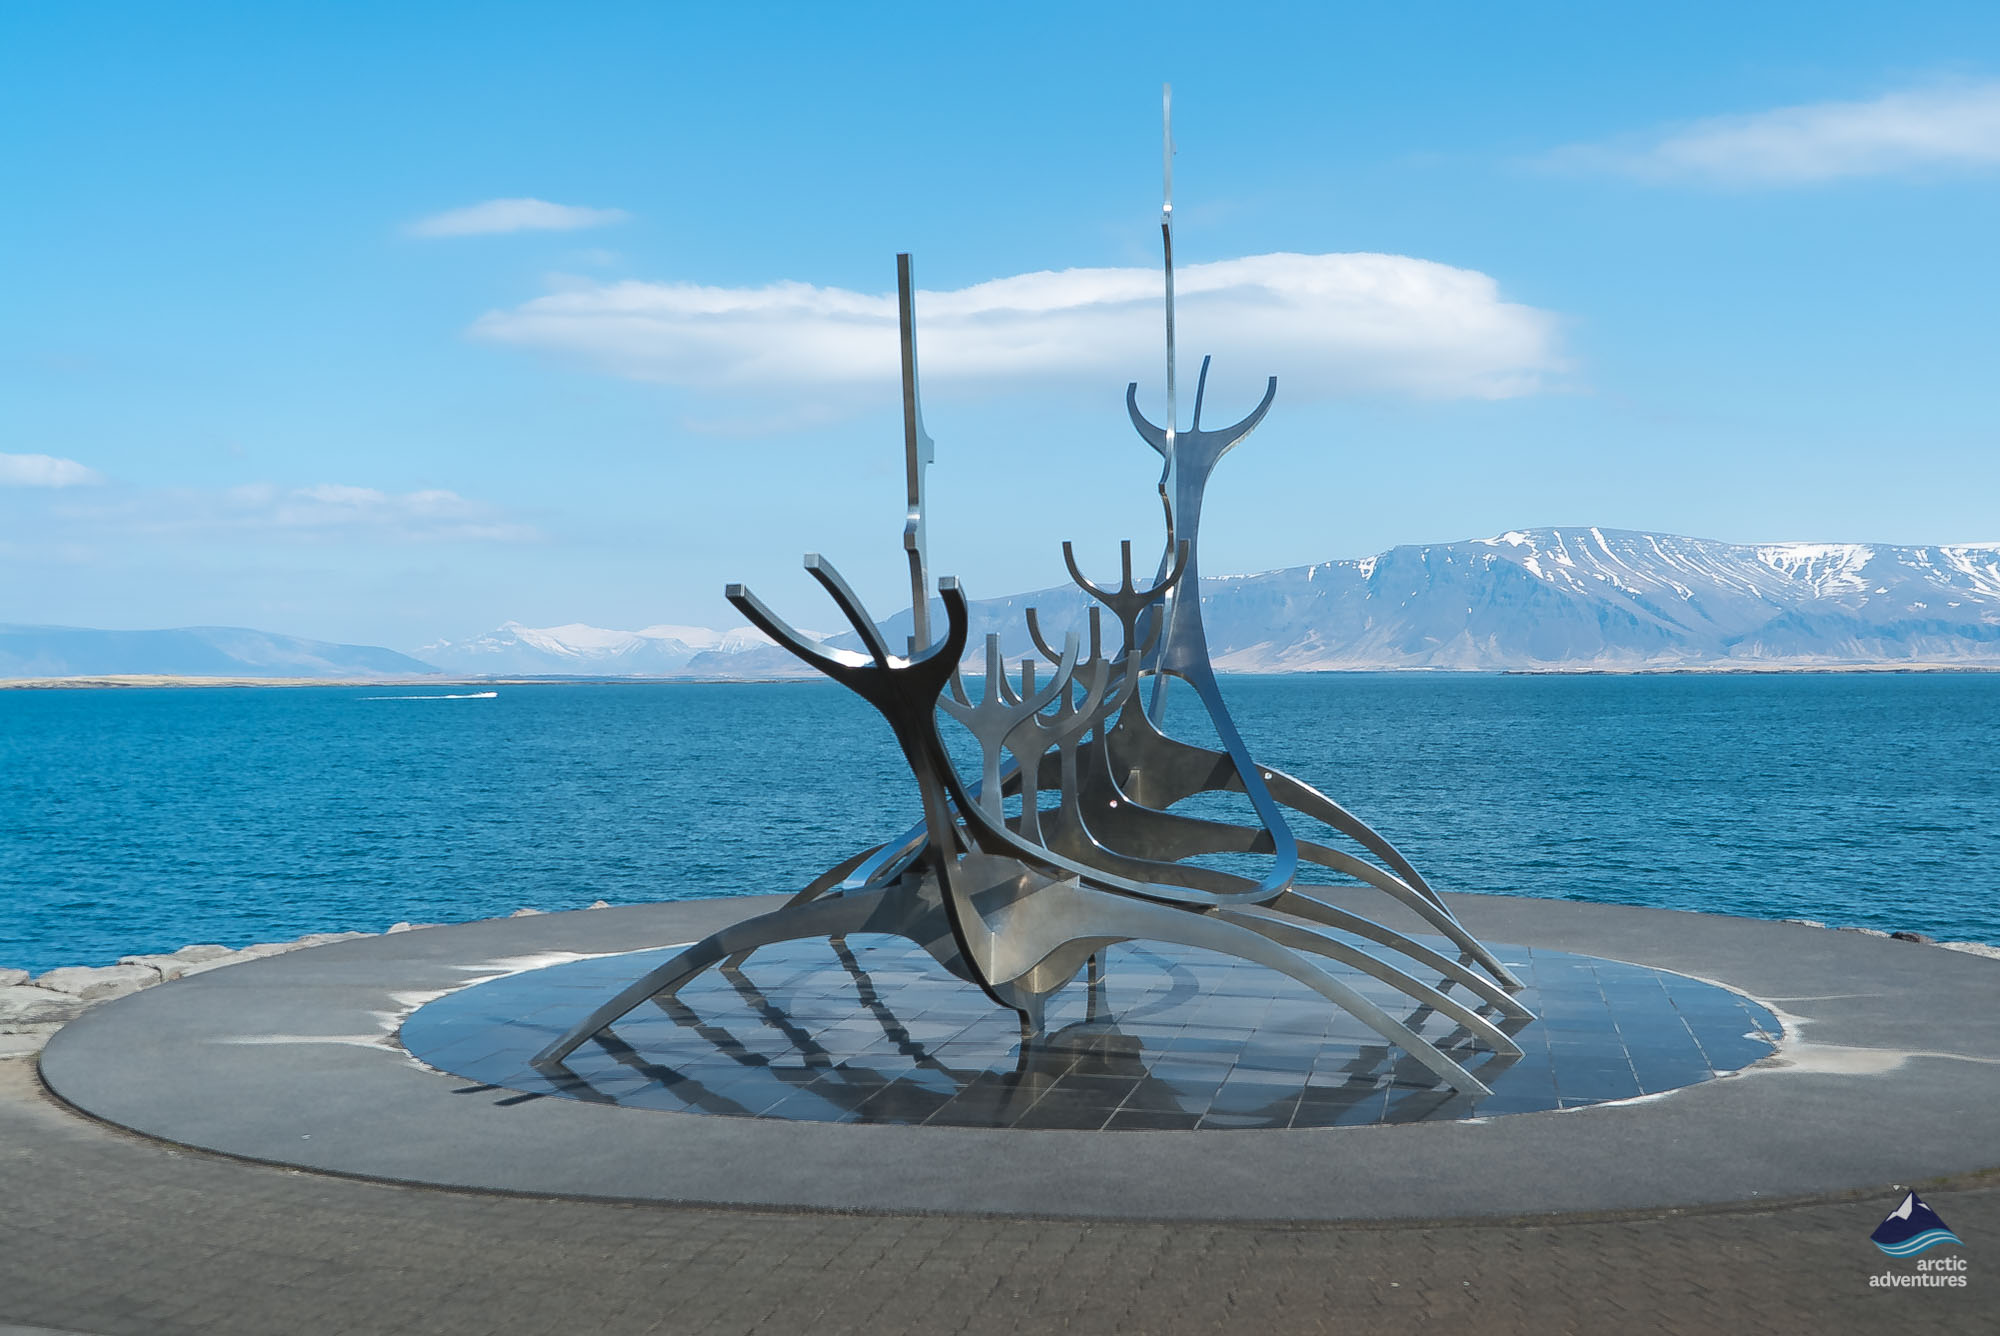 Sun Voyager in Reykjavík